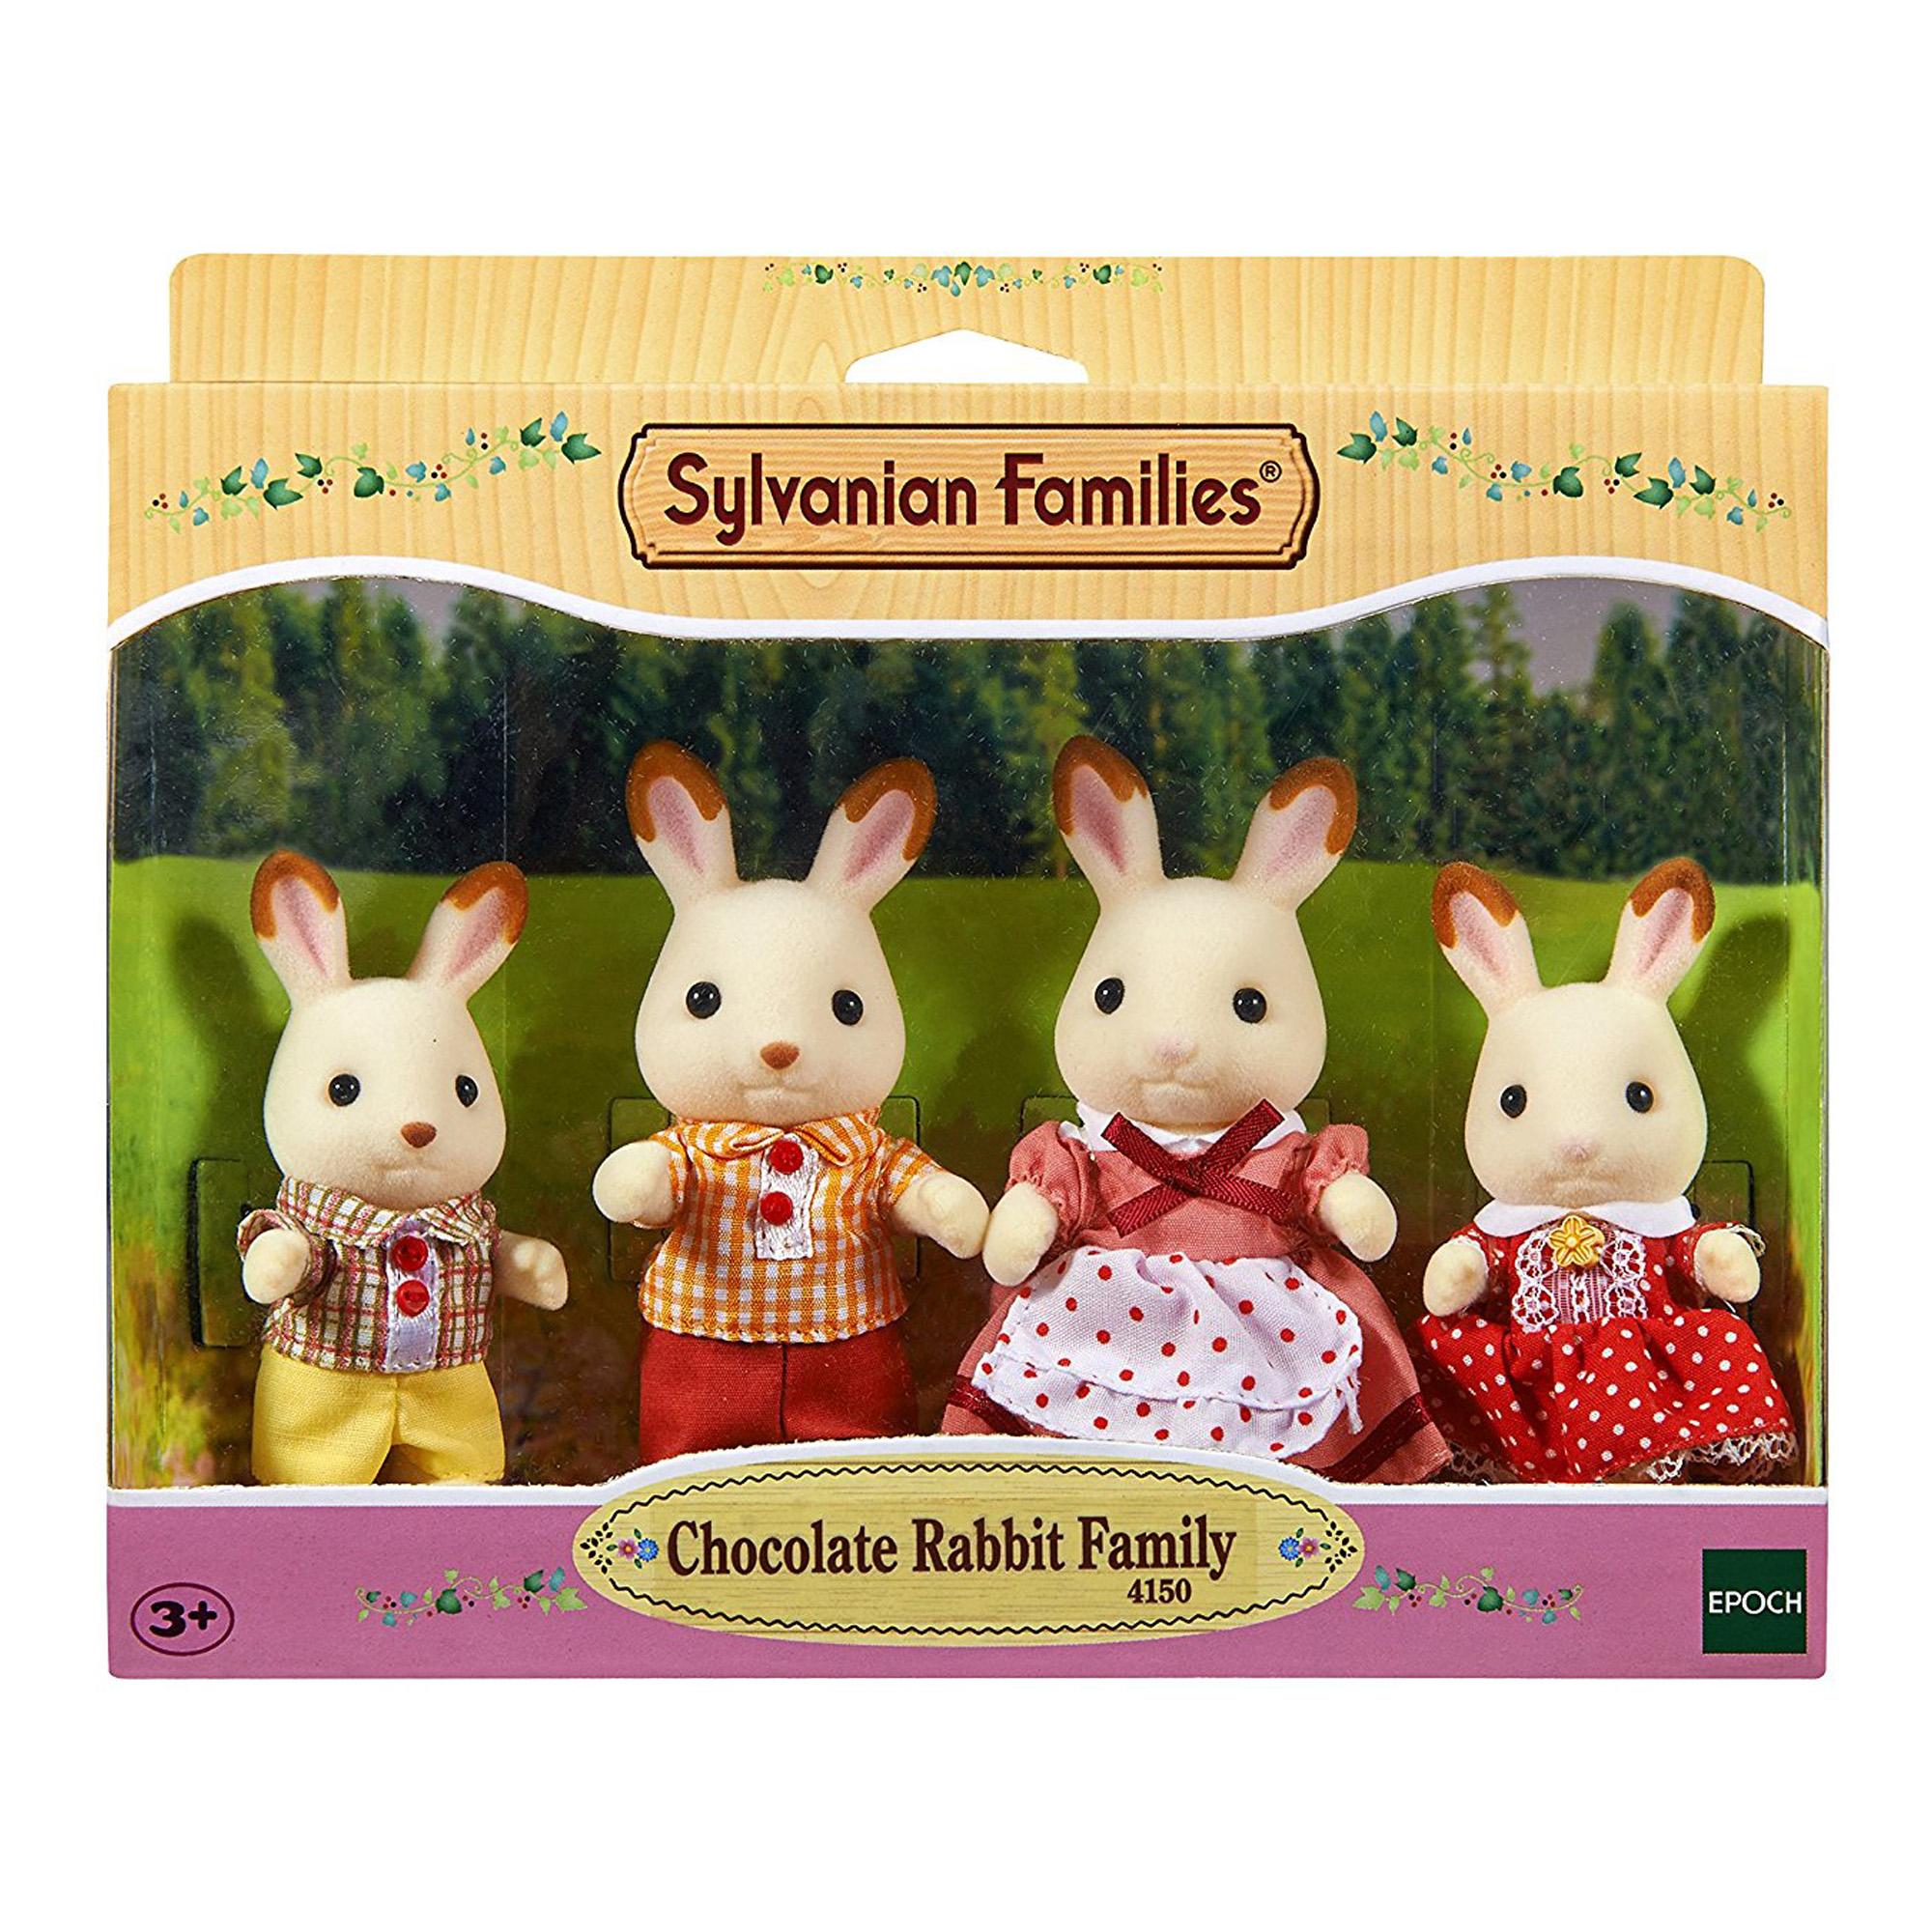 Jucarie Sylvanian Families Chocolate Rabbit Family 2